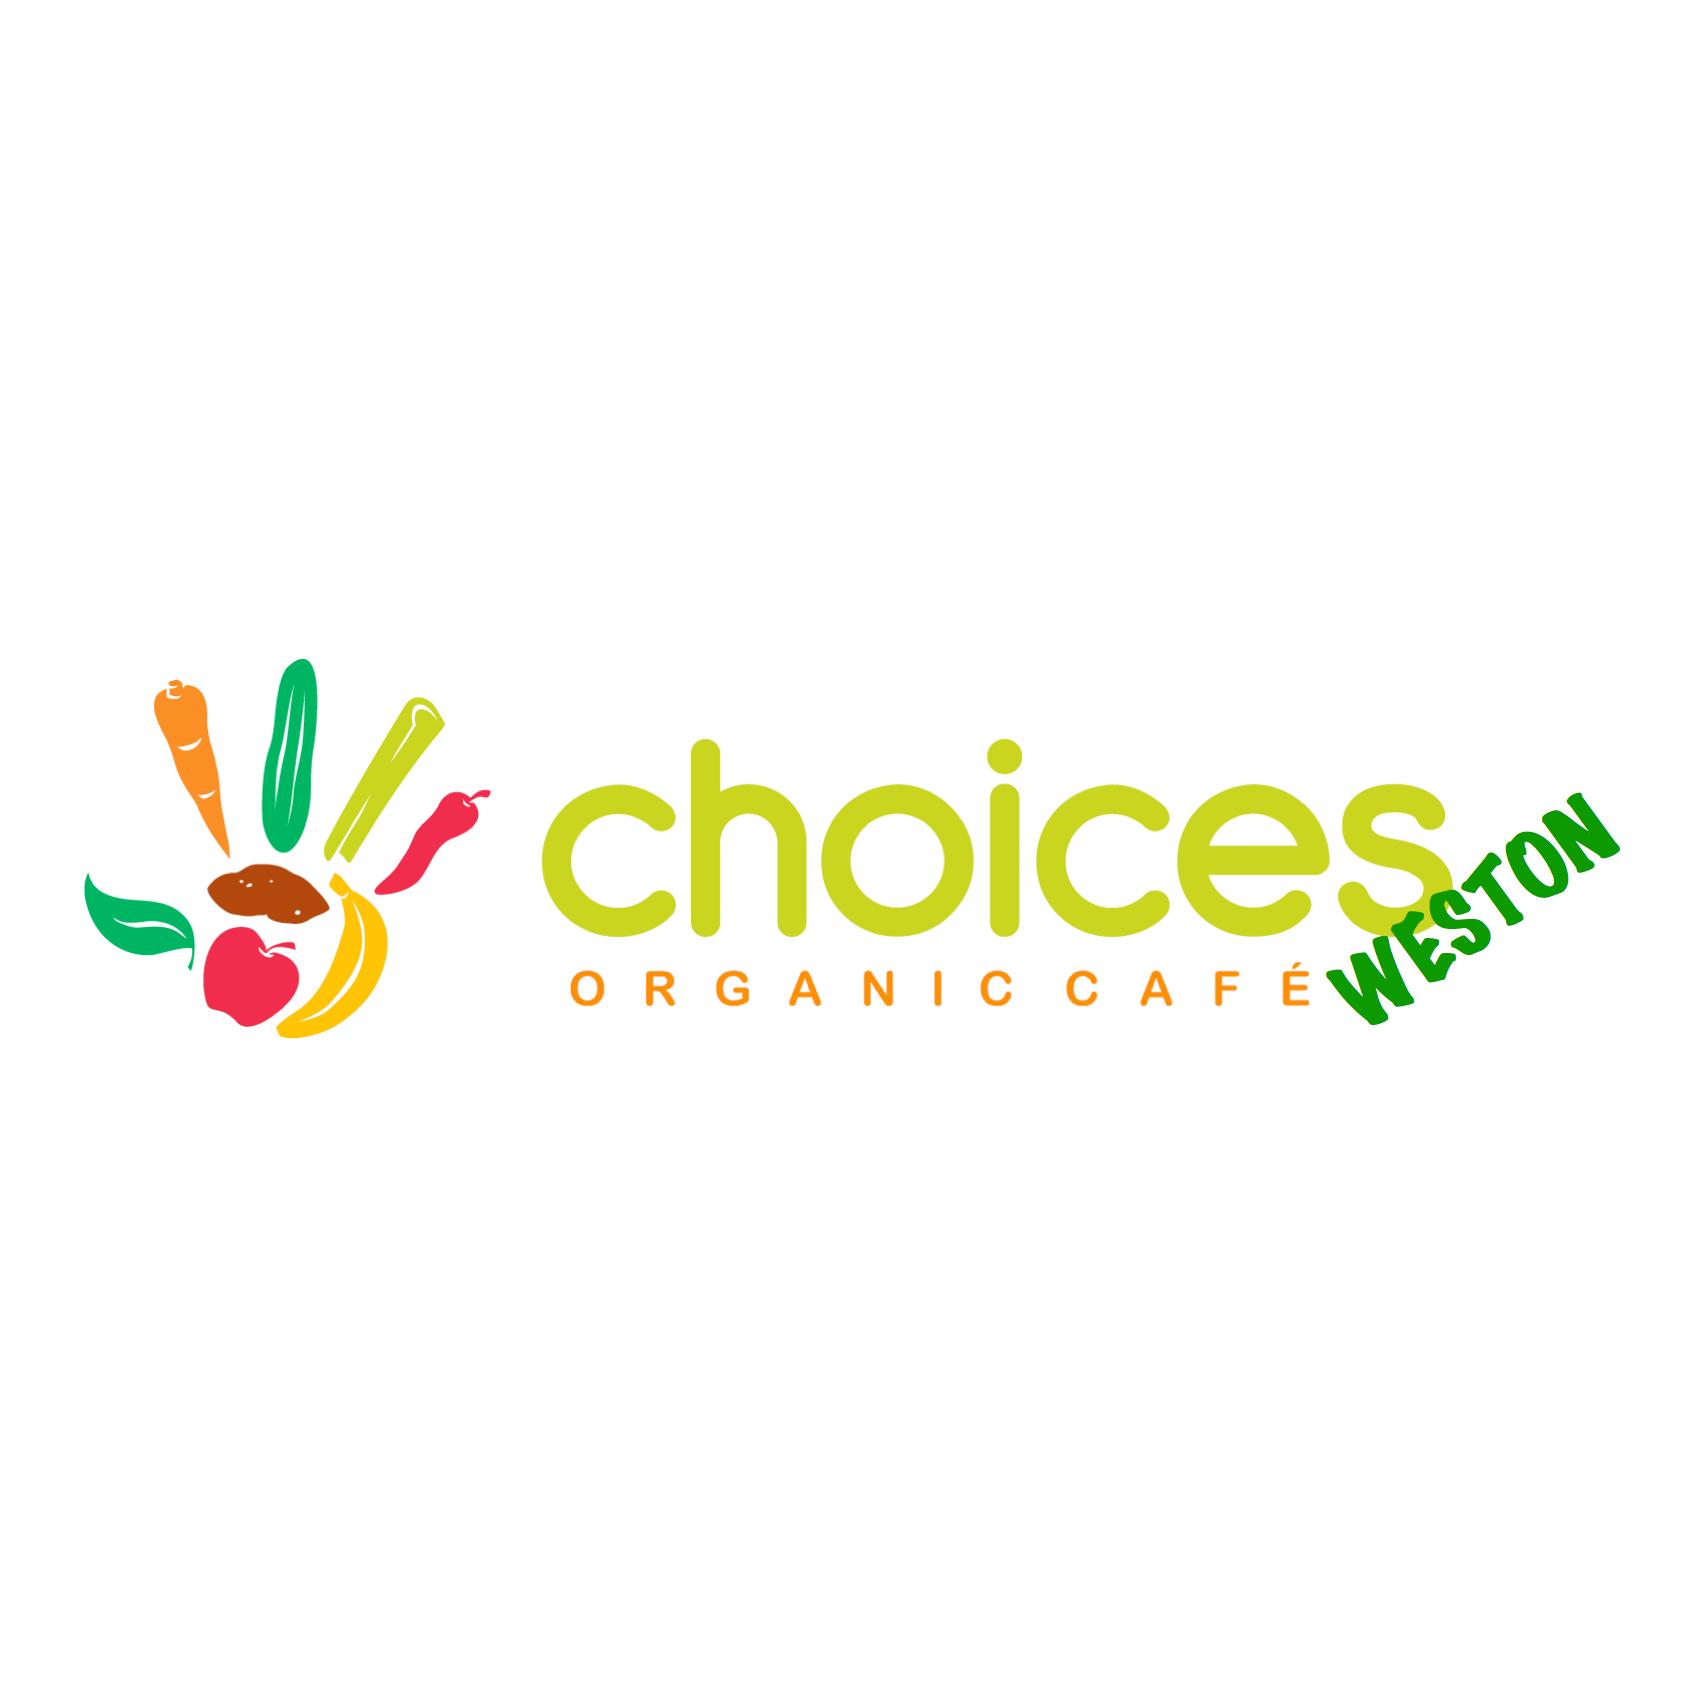 Choices Cafe Weston